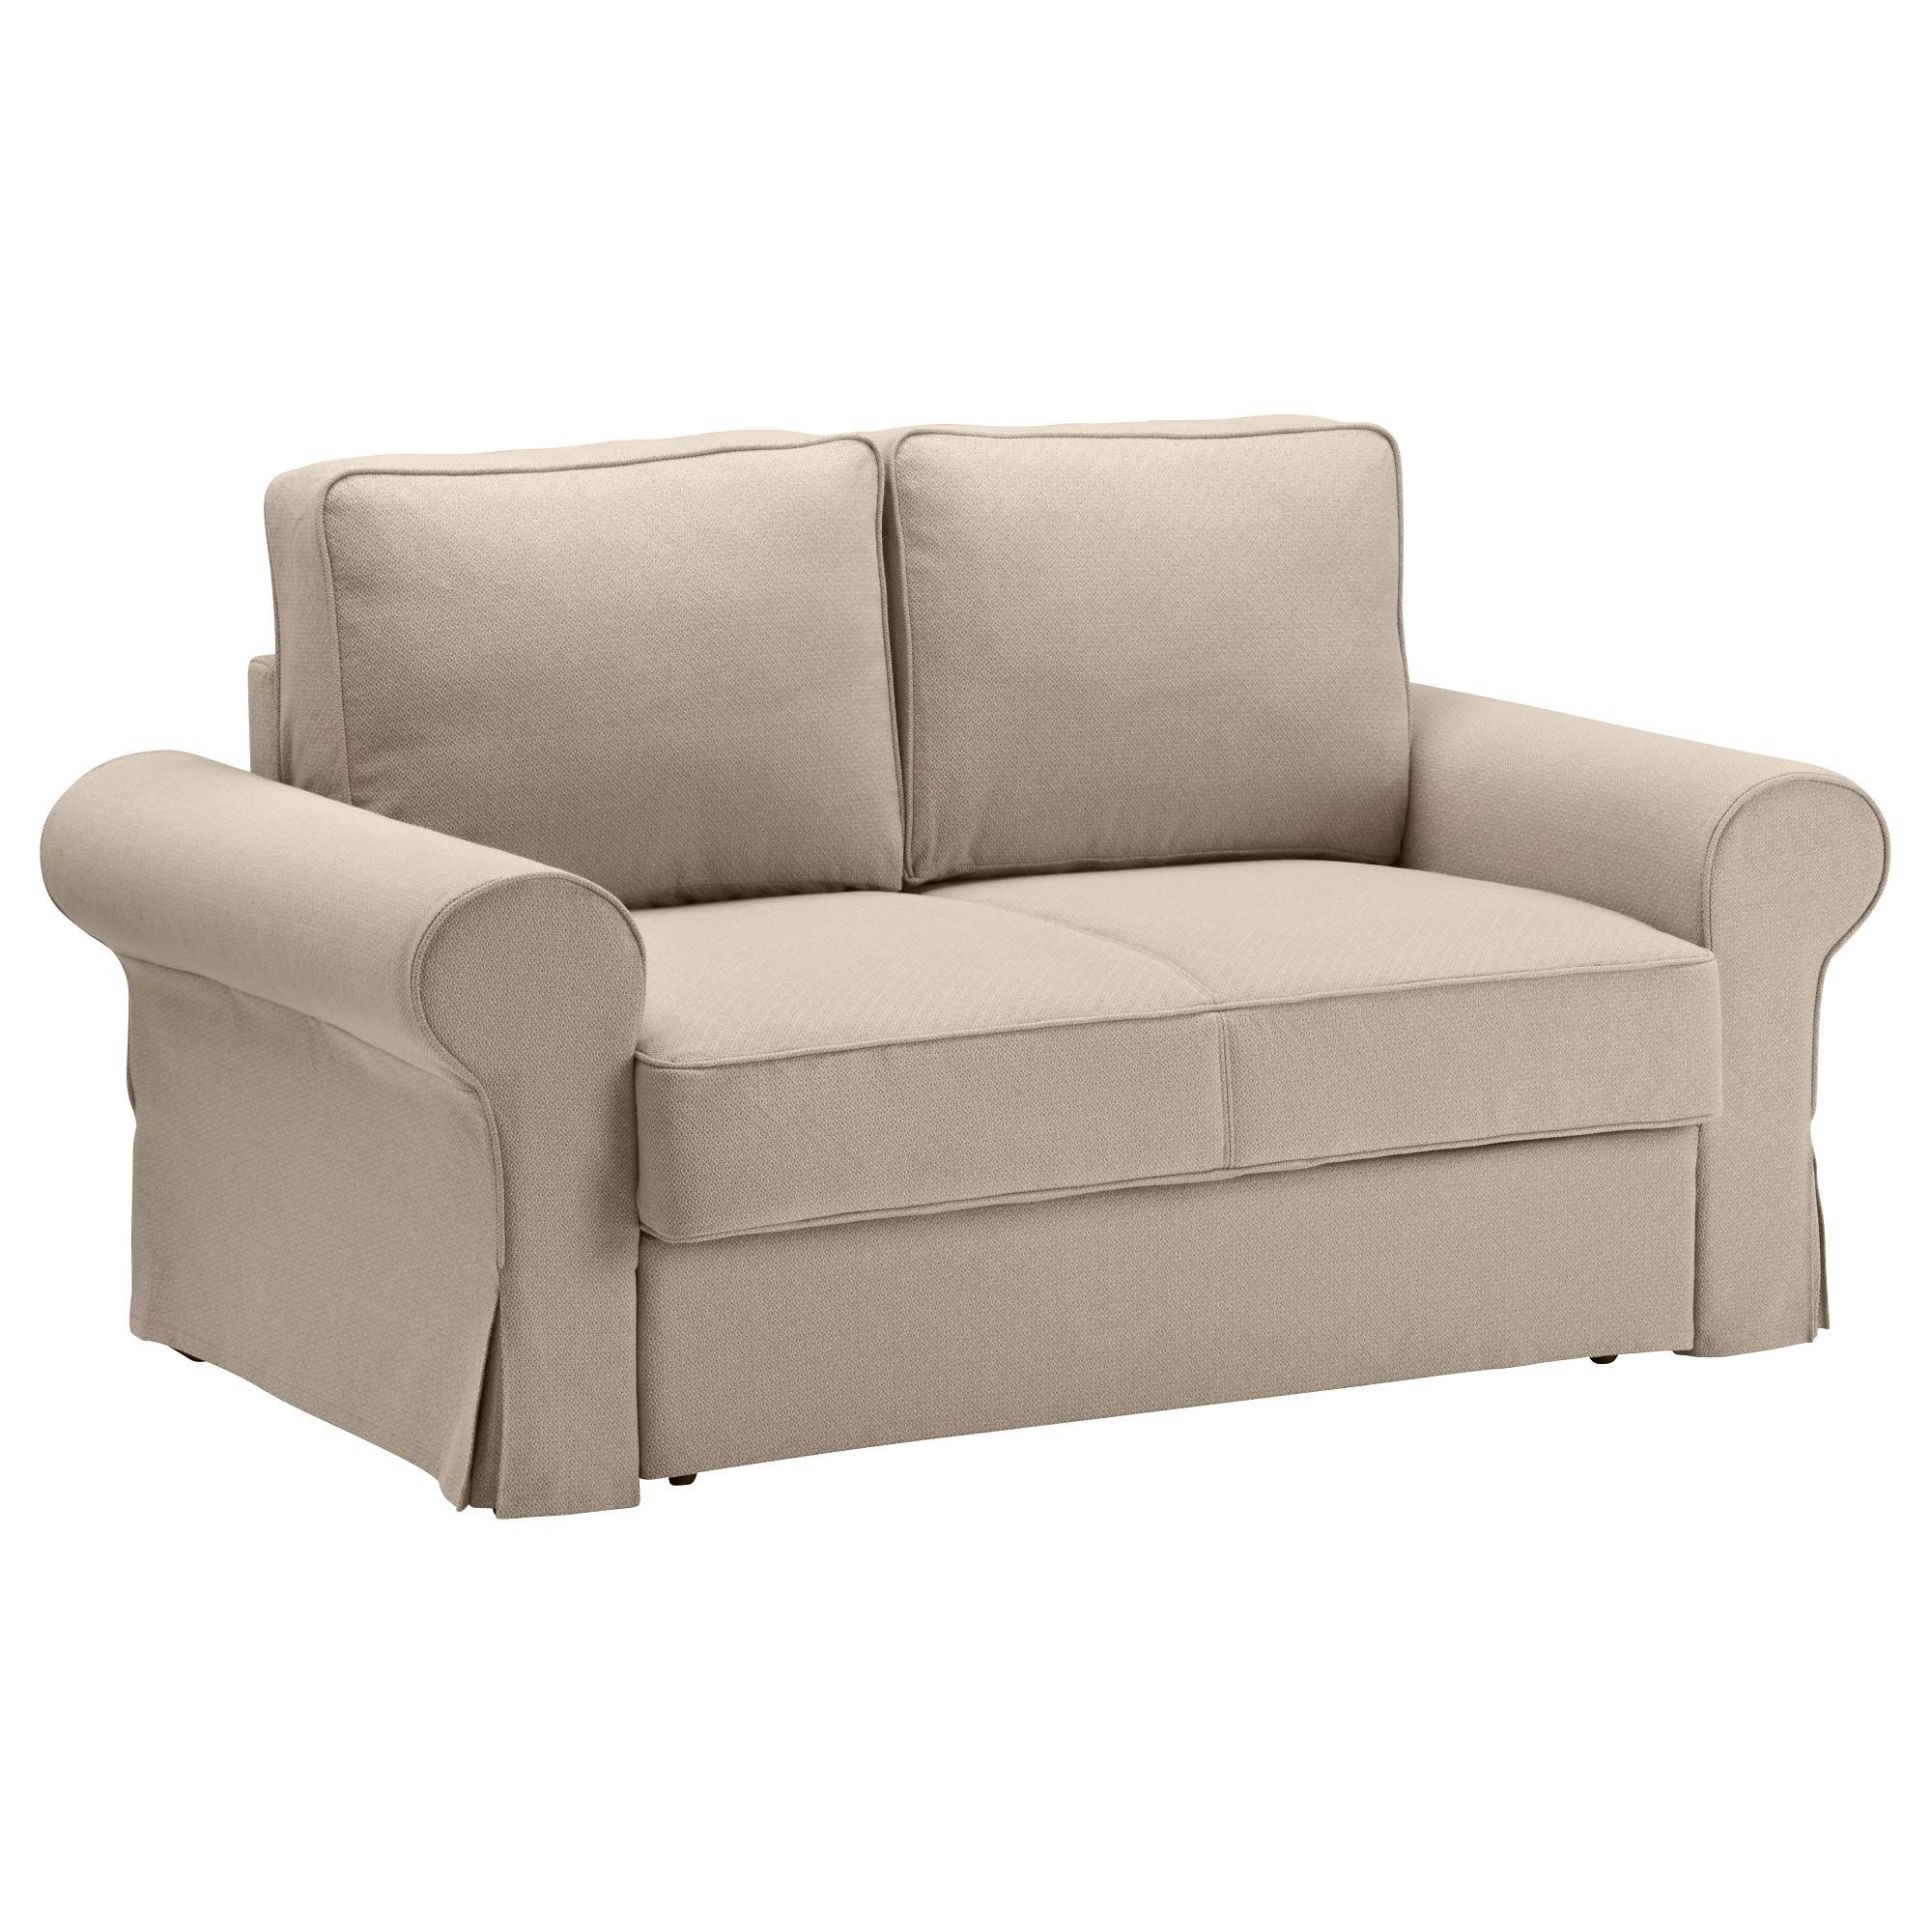 Sofas Cama De Ikea Y7du Backabro sofà Cama 2 Plazas Hylte Beige Ikea